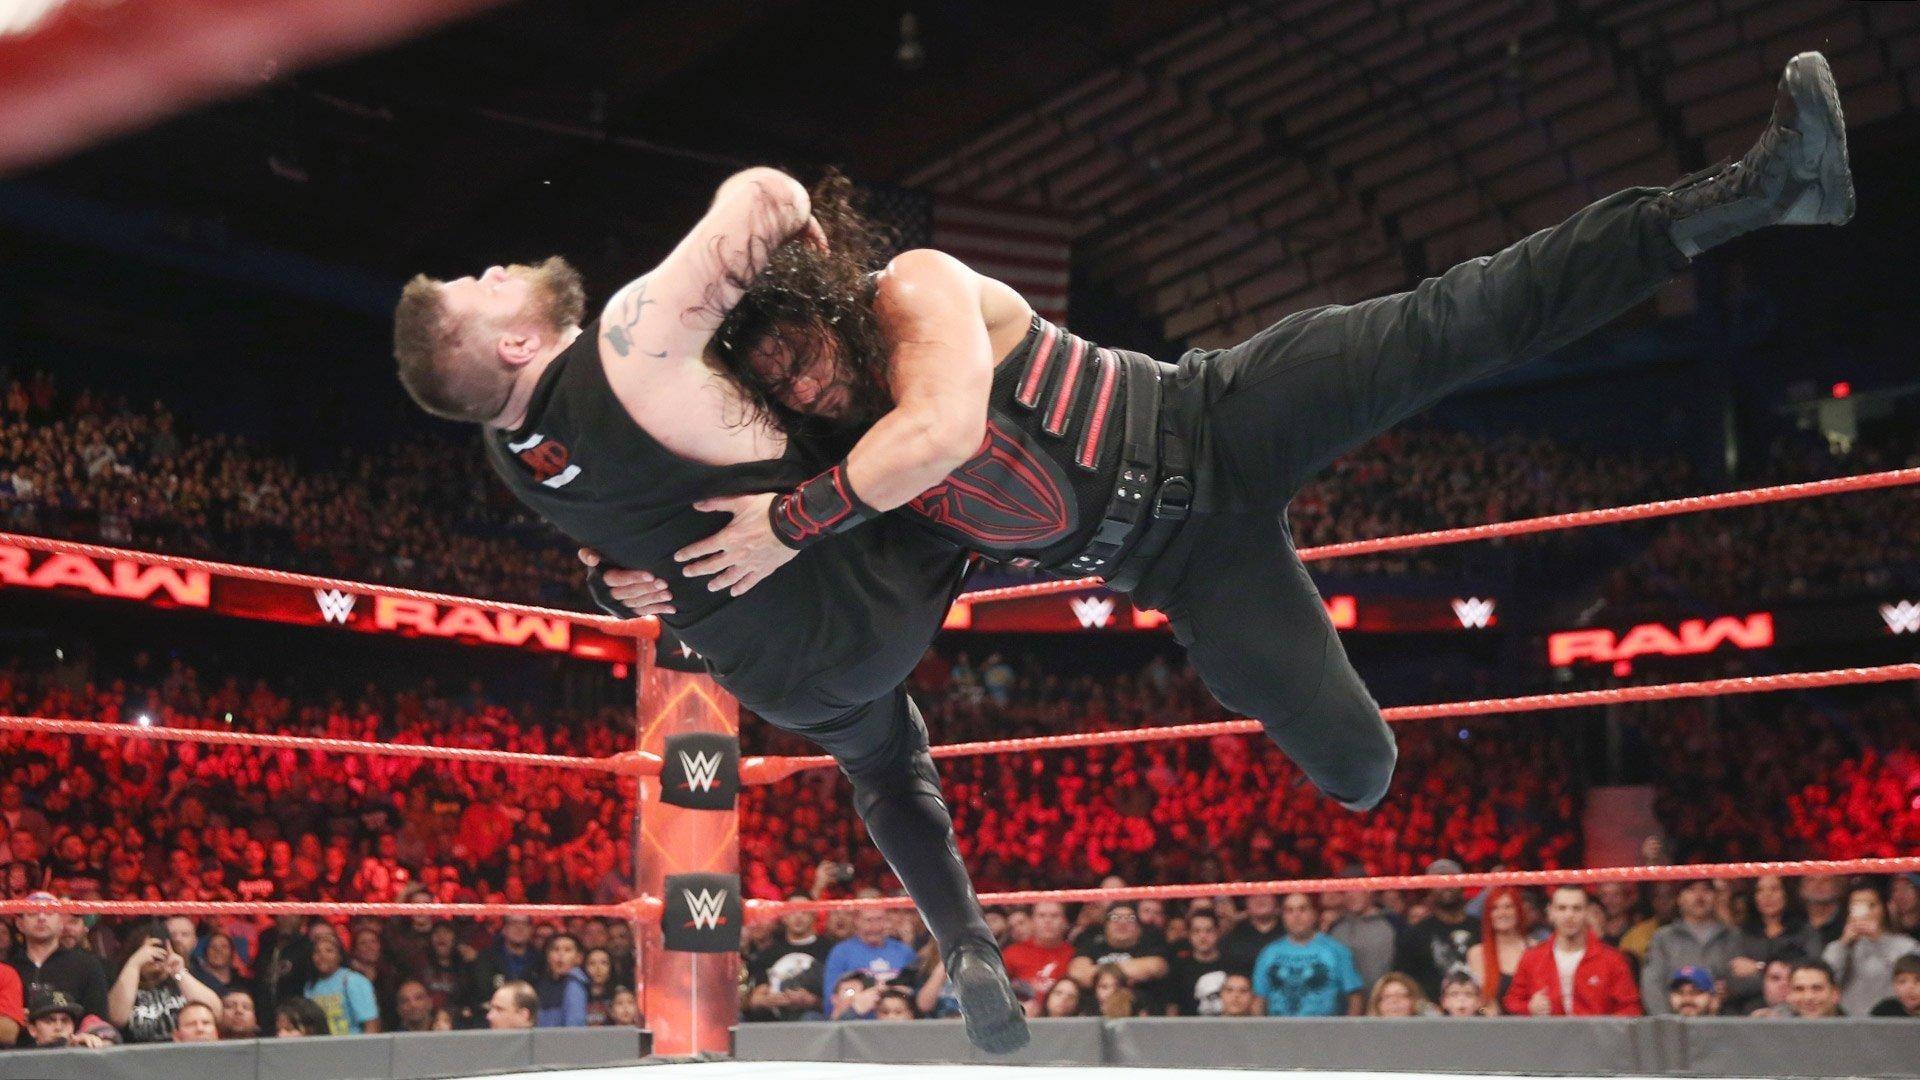 WWE Raw Season 24 :Episode 52  December 26, 2016 (Chicago, IL)